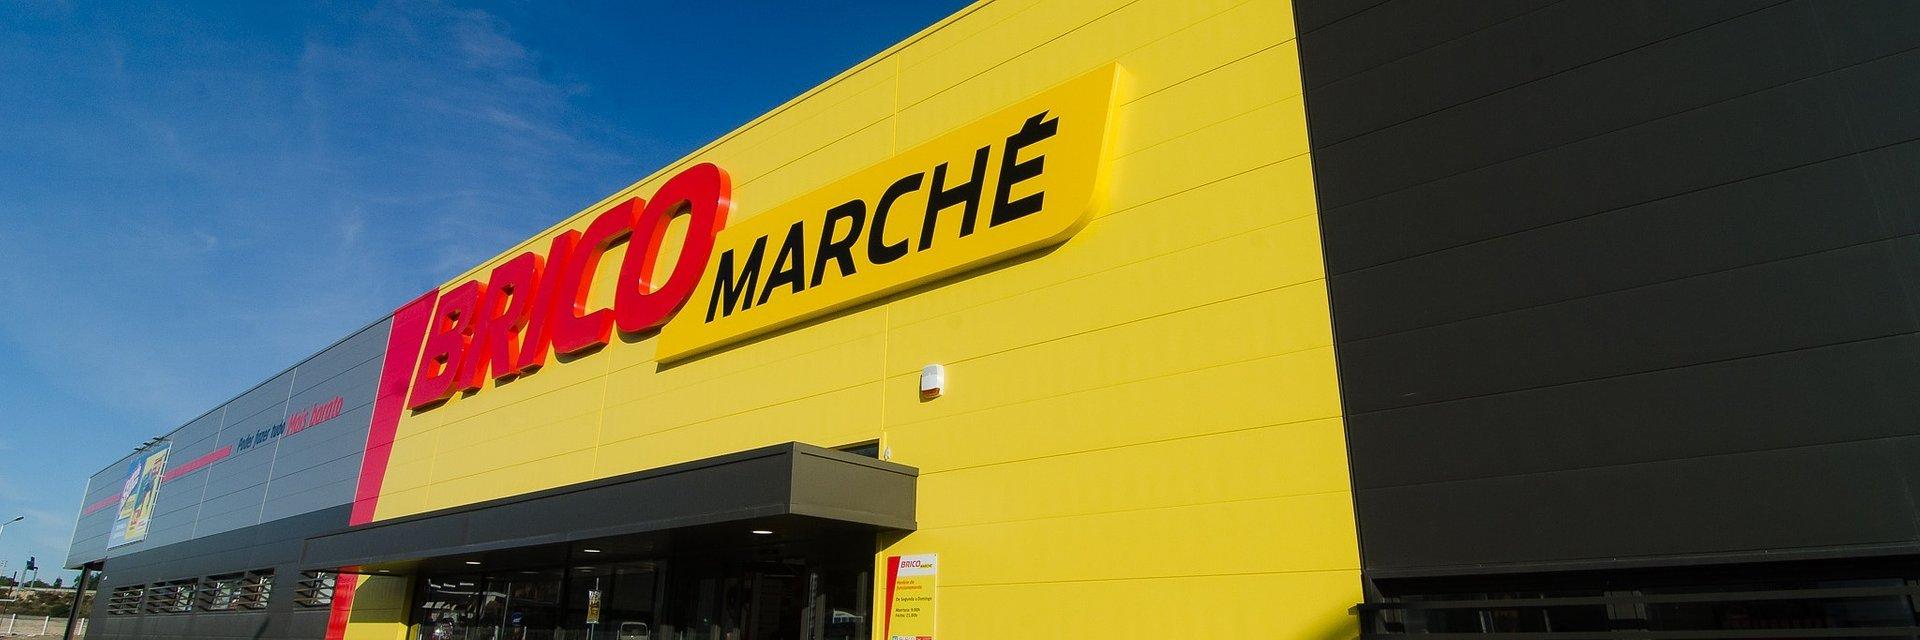 Bricomarché abre loja em Barcelos